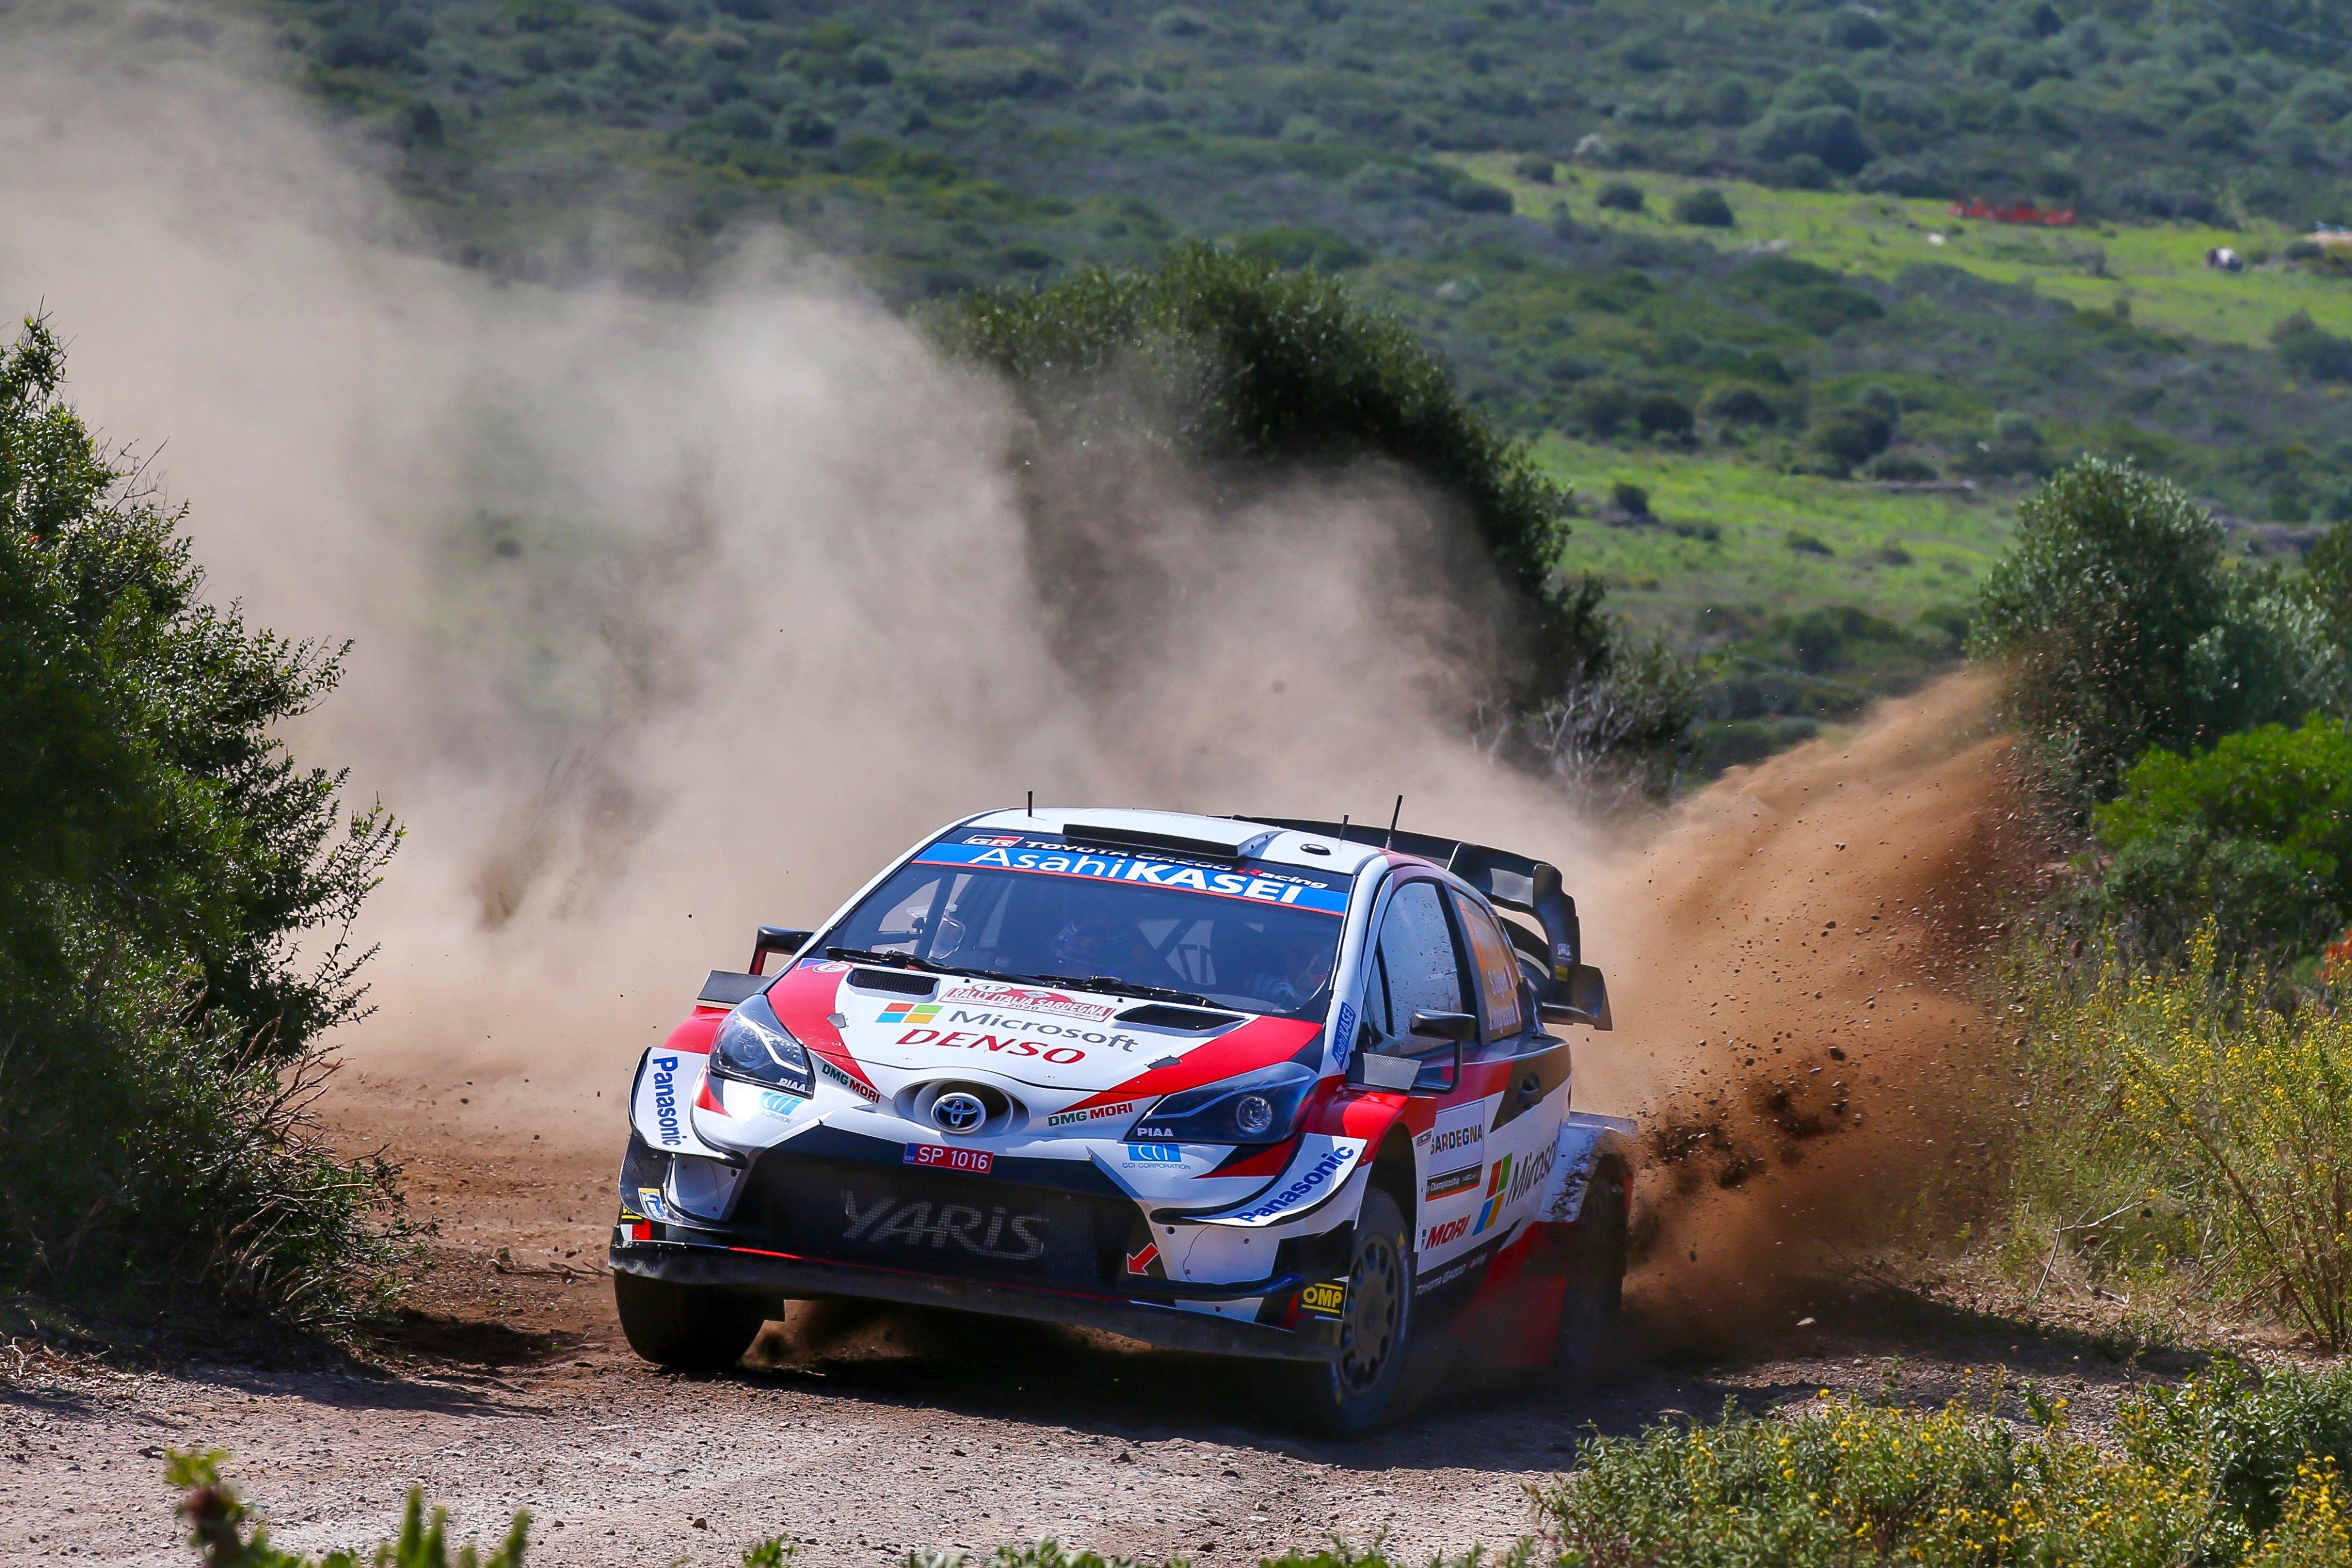 WRC: Rally d' Italia - Sardegna [8-10 Octubre] - Página 2 Ej3oZ15WoAAUuKg?format=jpg&name=4096x4096